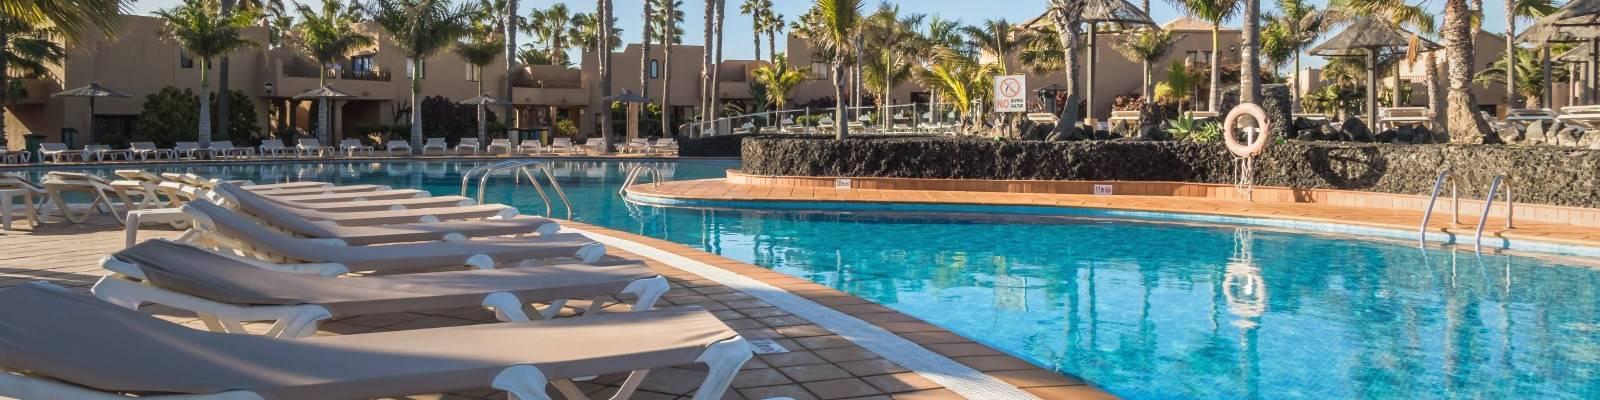 Hotel auf Corralejo, Fuerteventura | Oasis Duna